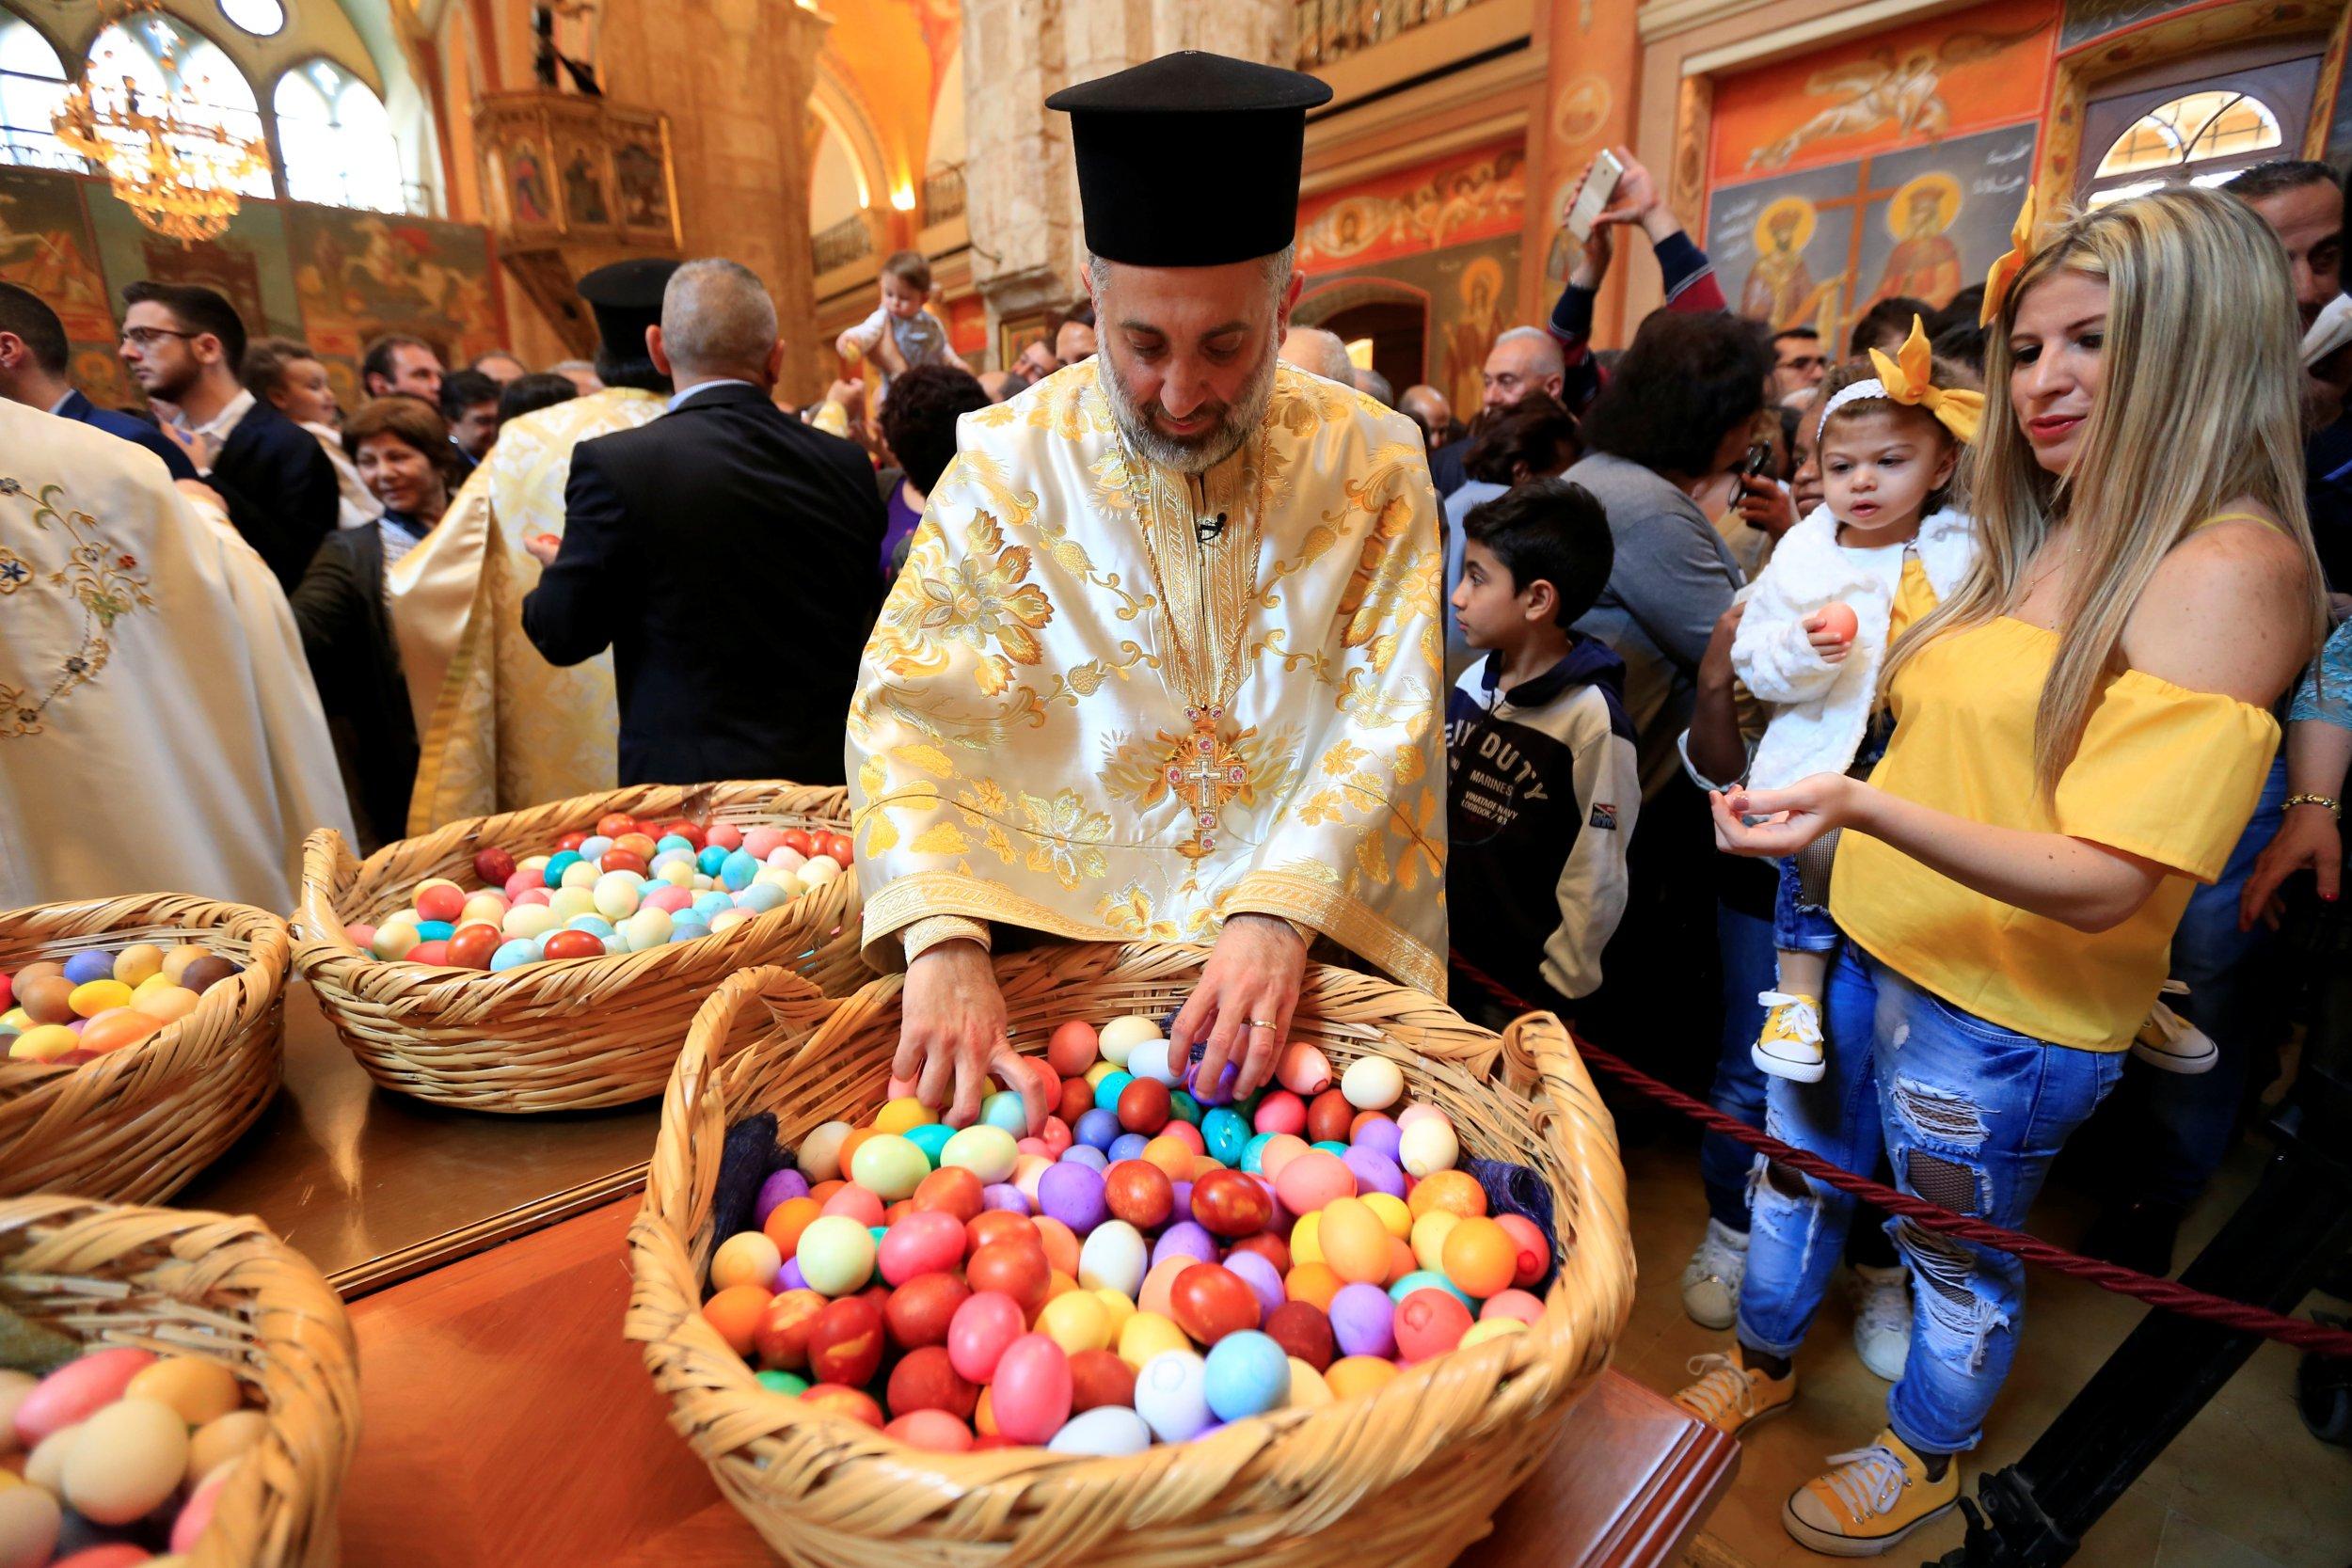 религиозные традиции картинки добычи